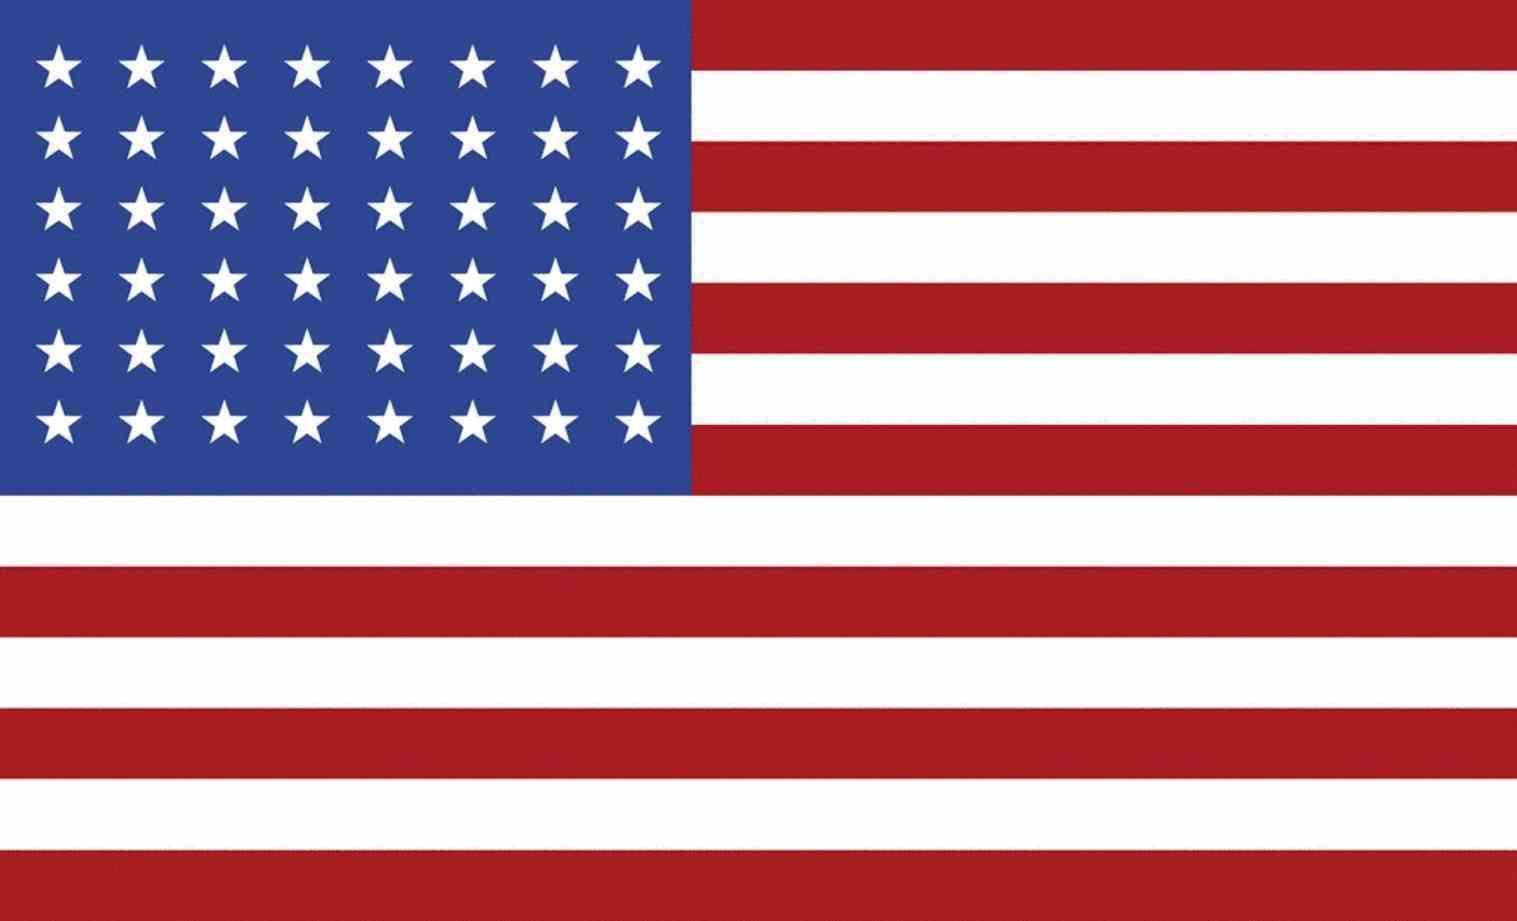 1517x921 With Grommets Randomrhcom Thin Rustic American Flag